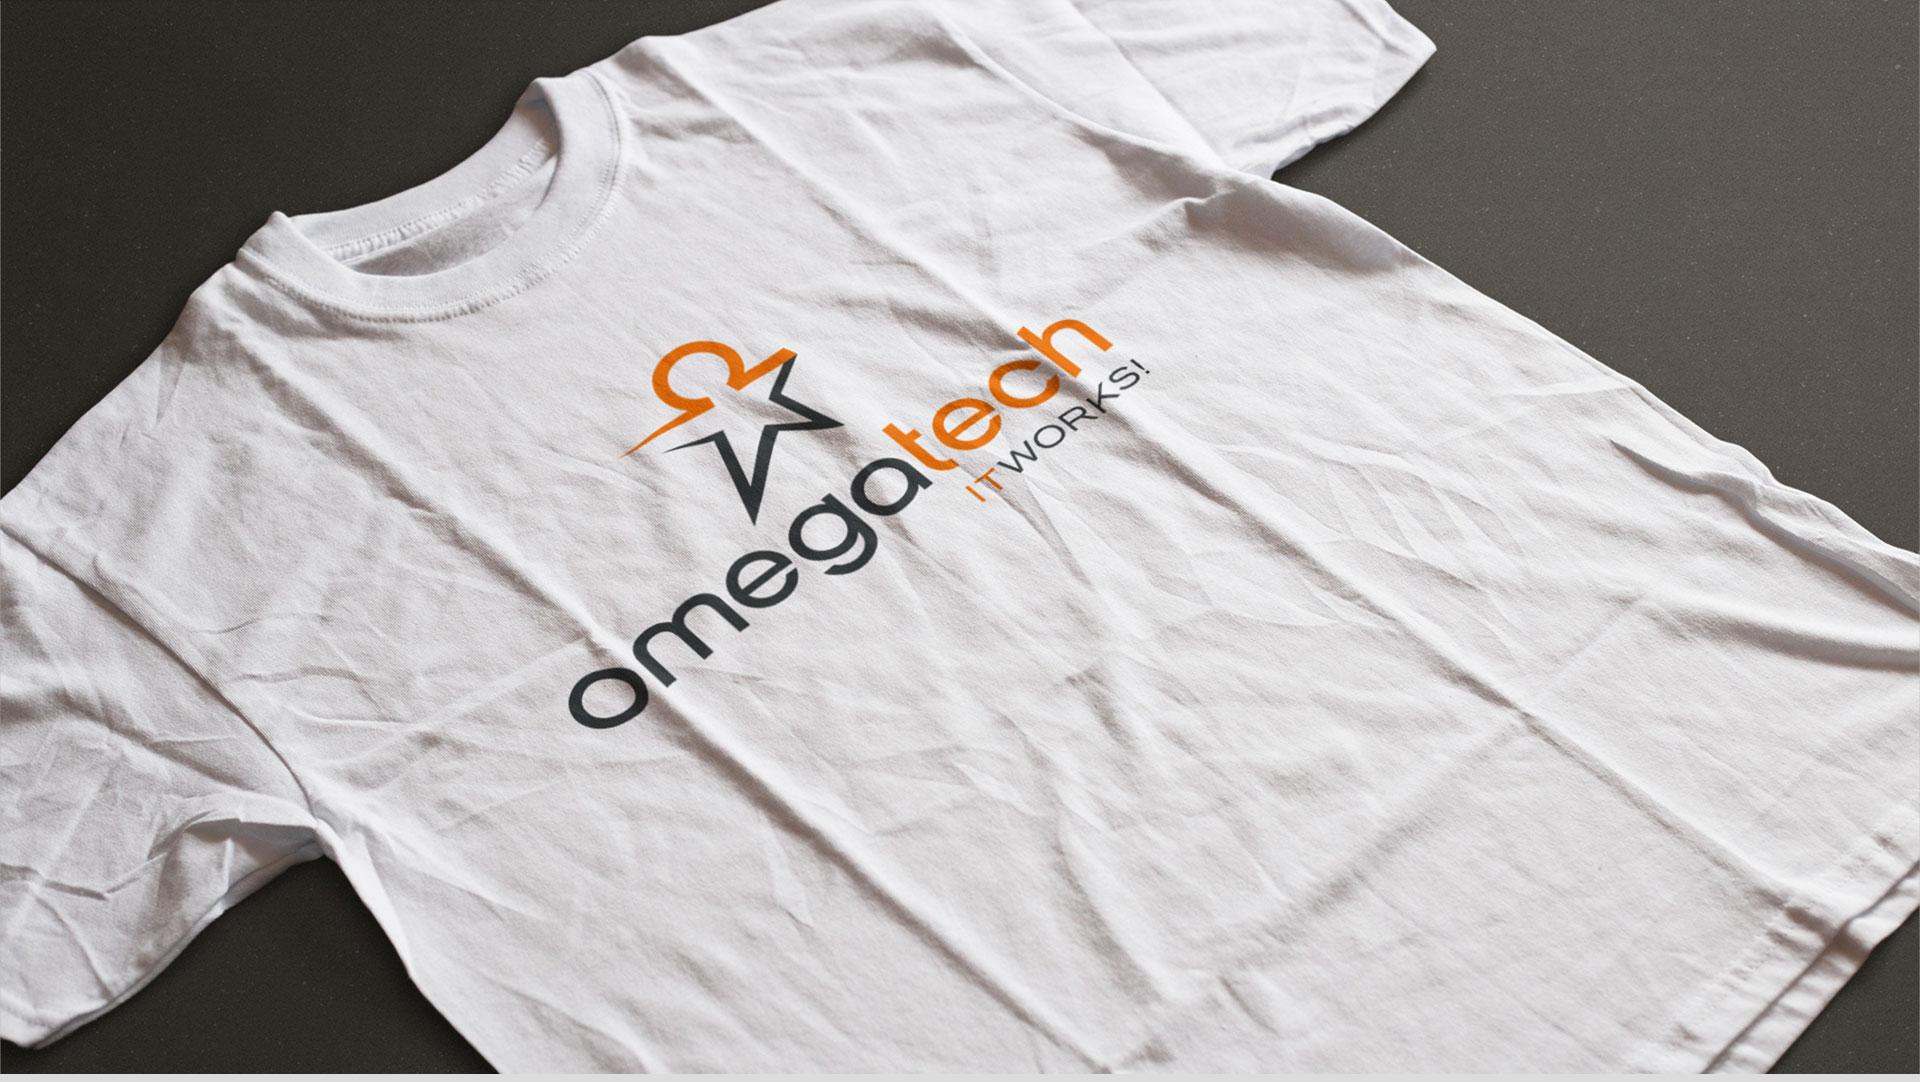 omegatech-zerouno-design-branding-tshirt